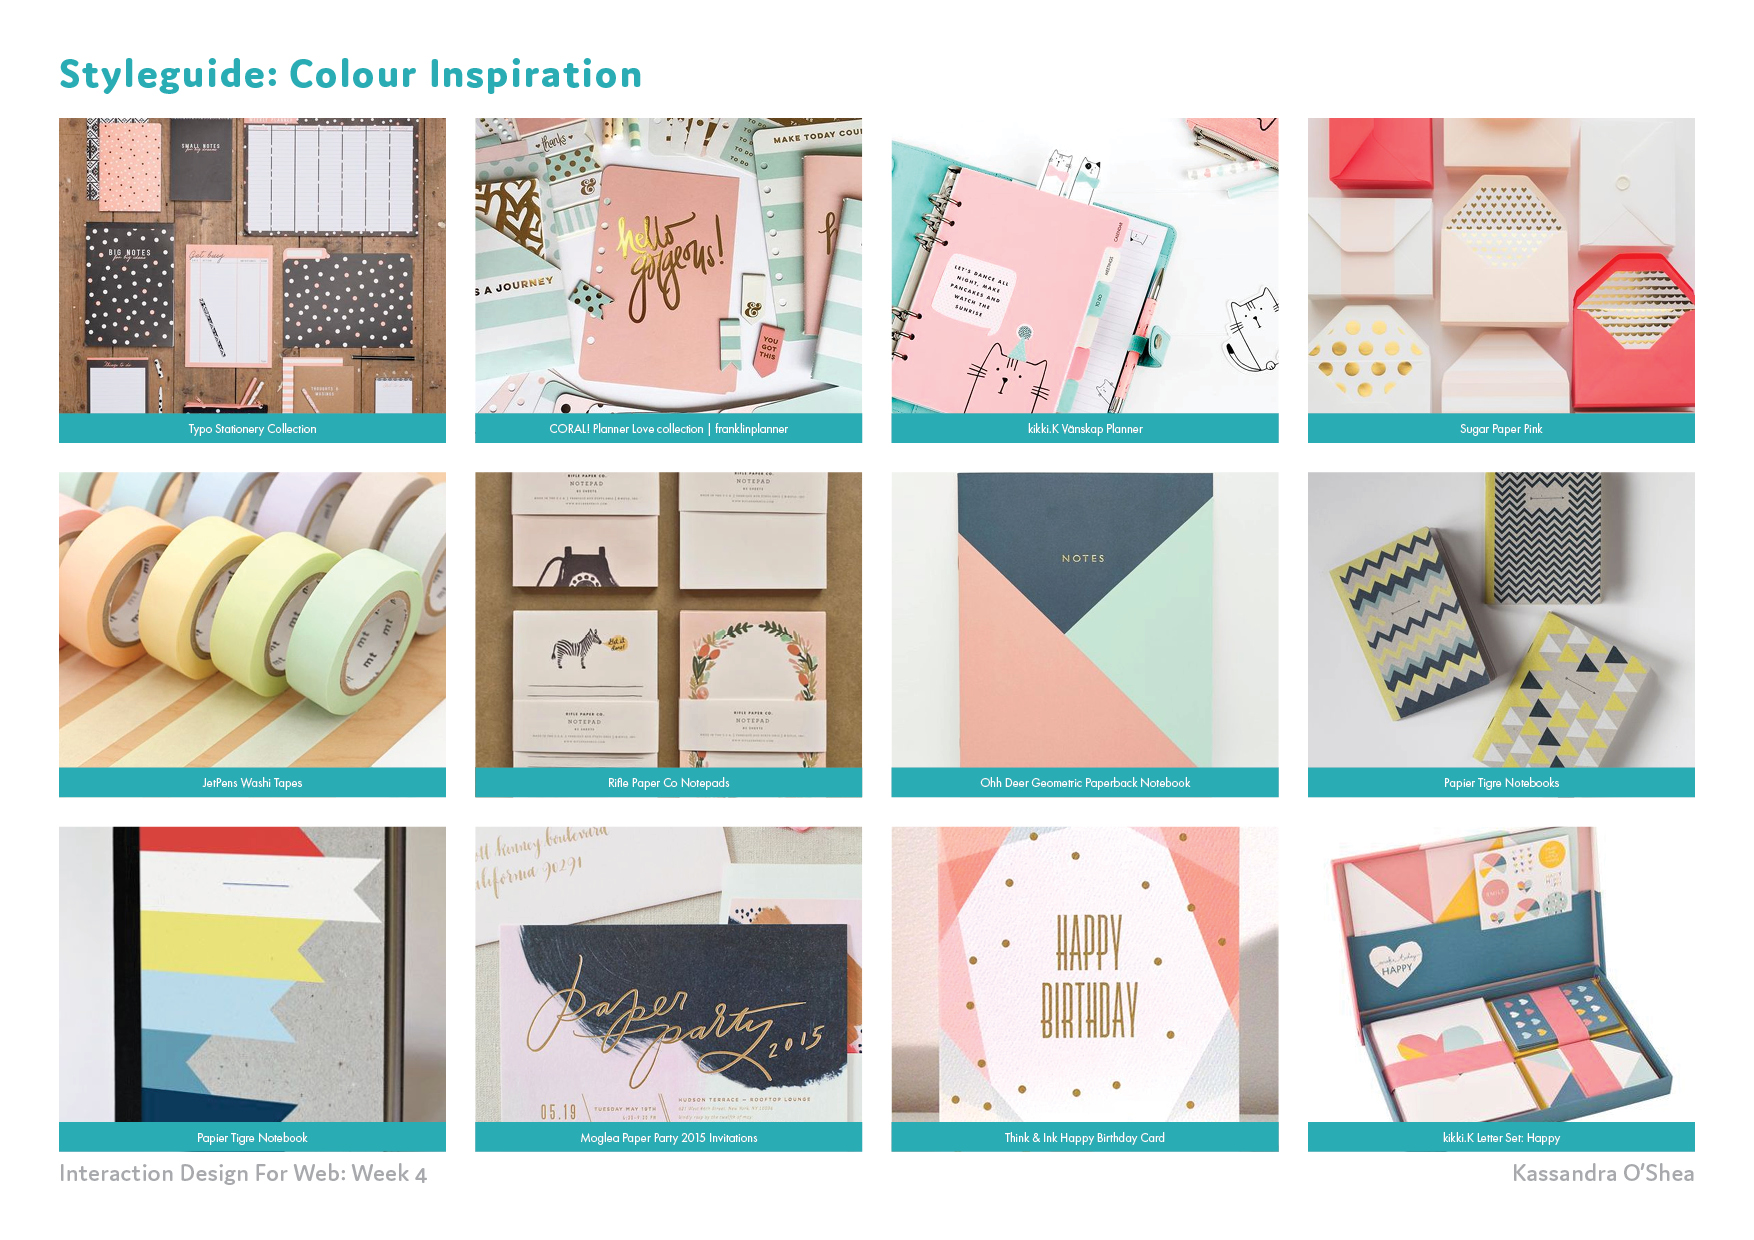 Styleguide: Colour Inspiration